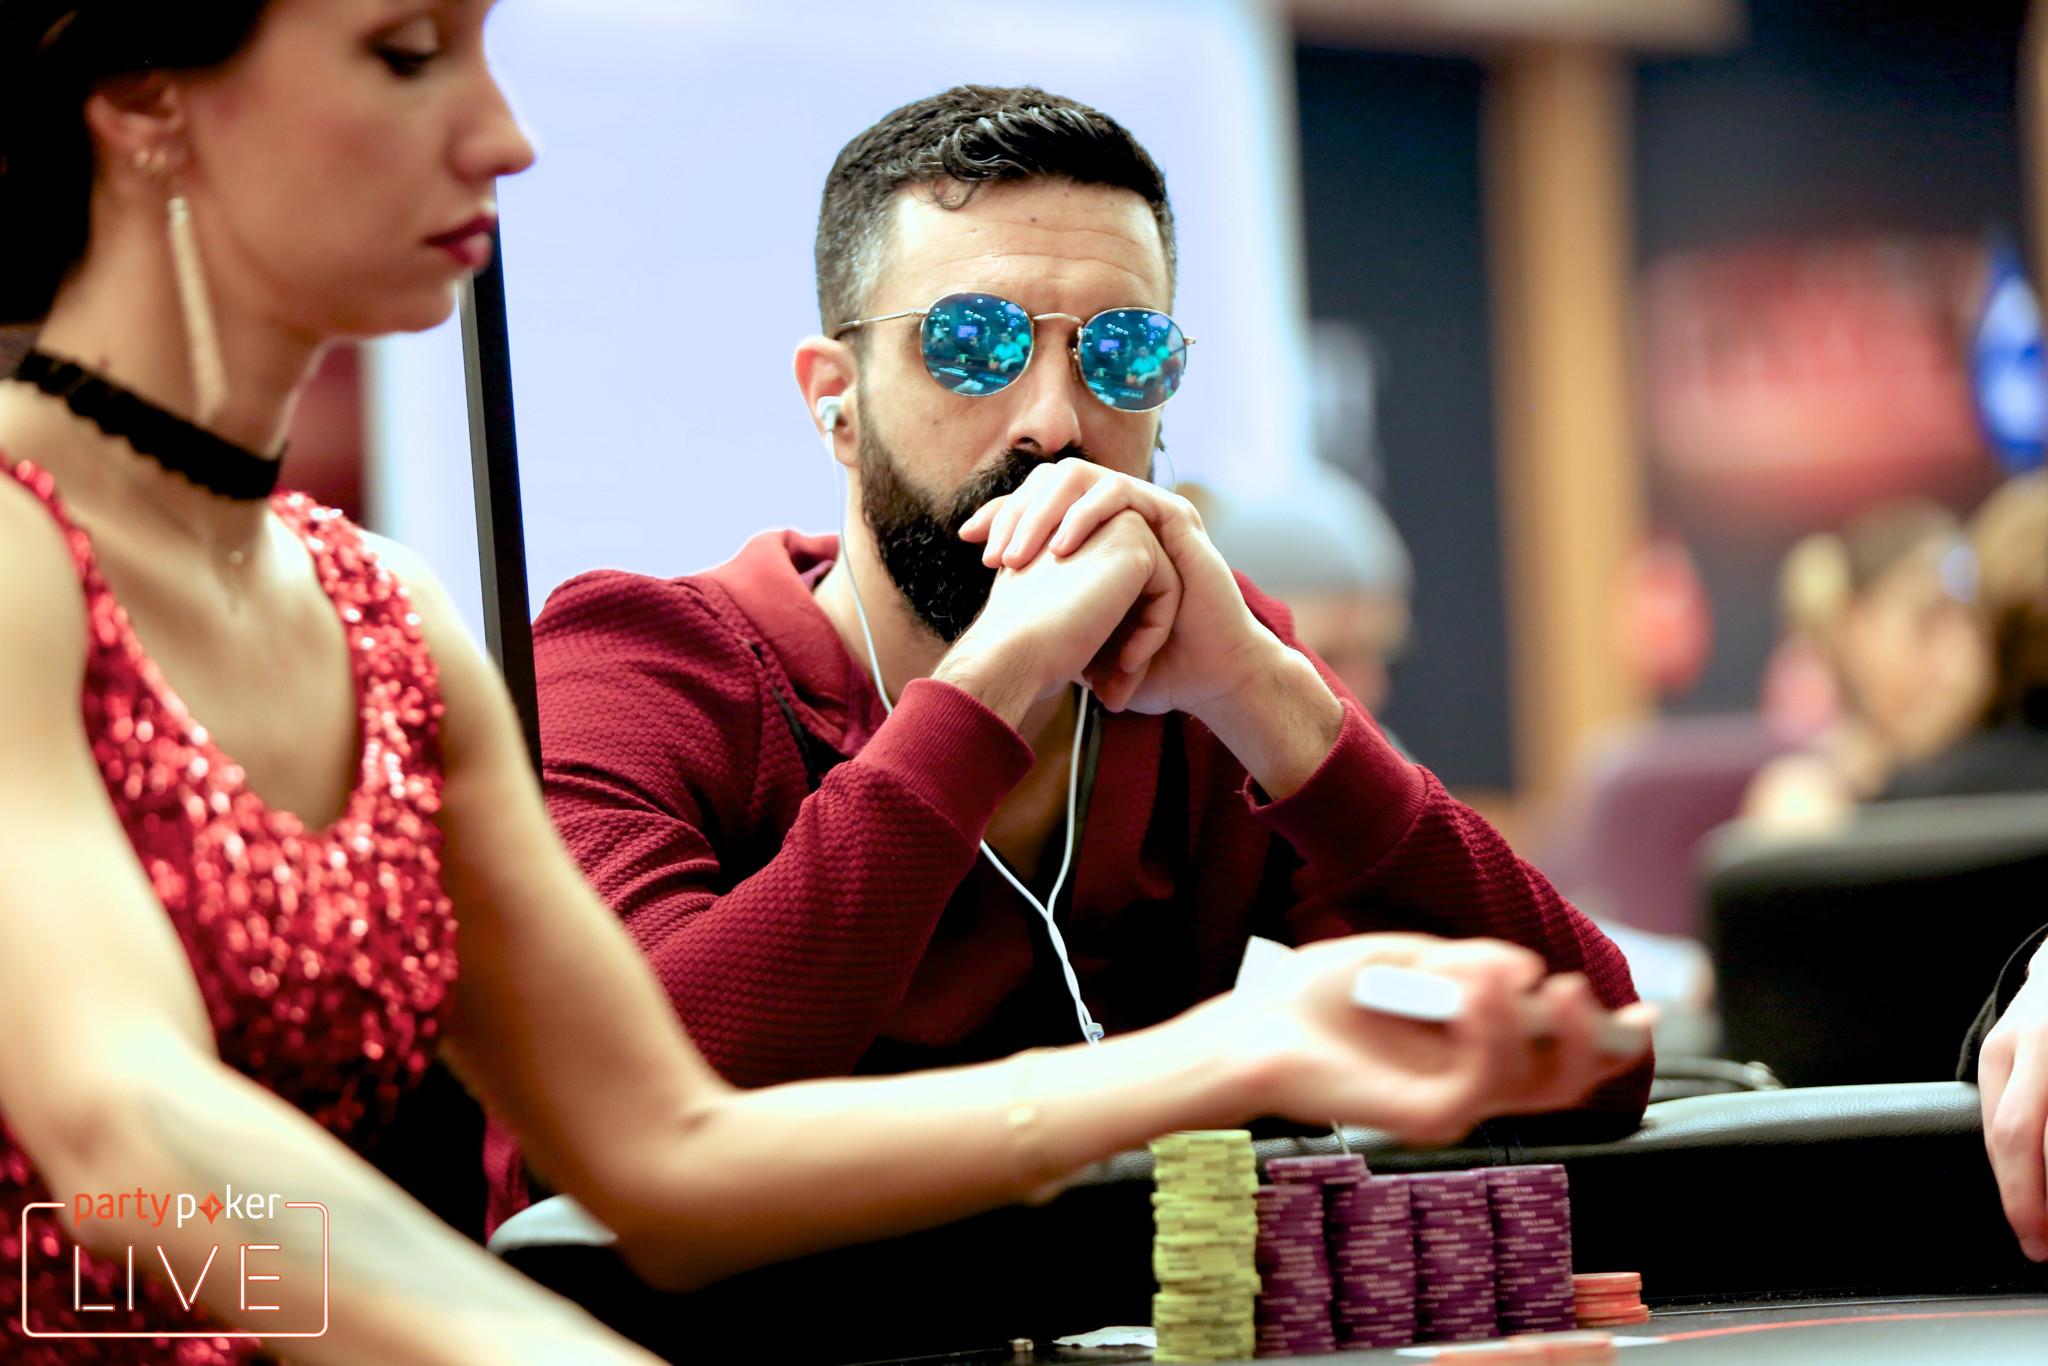 Andreas Christoforou Wins The 2019 Merit Poker Classic Main Event For 565 157 Poslednie Pokernye Novosti Partypoker Live